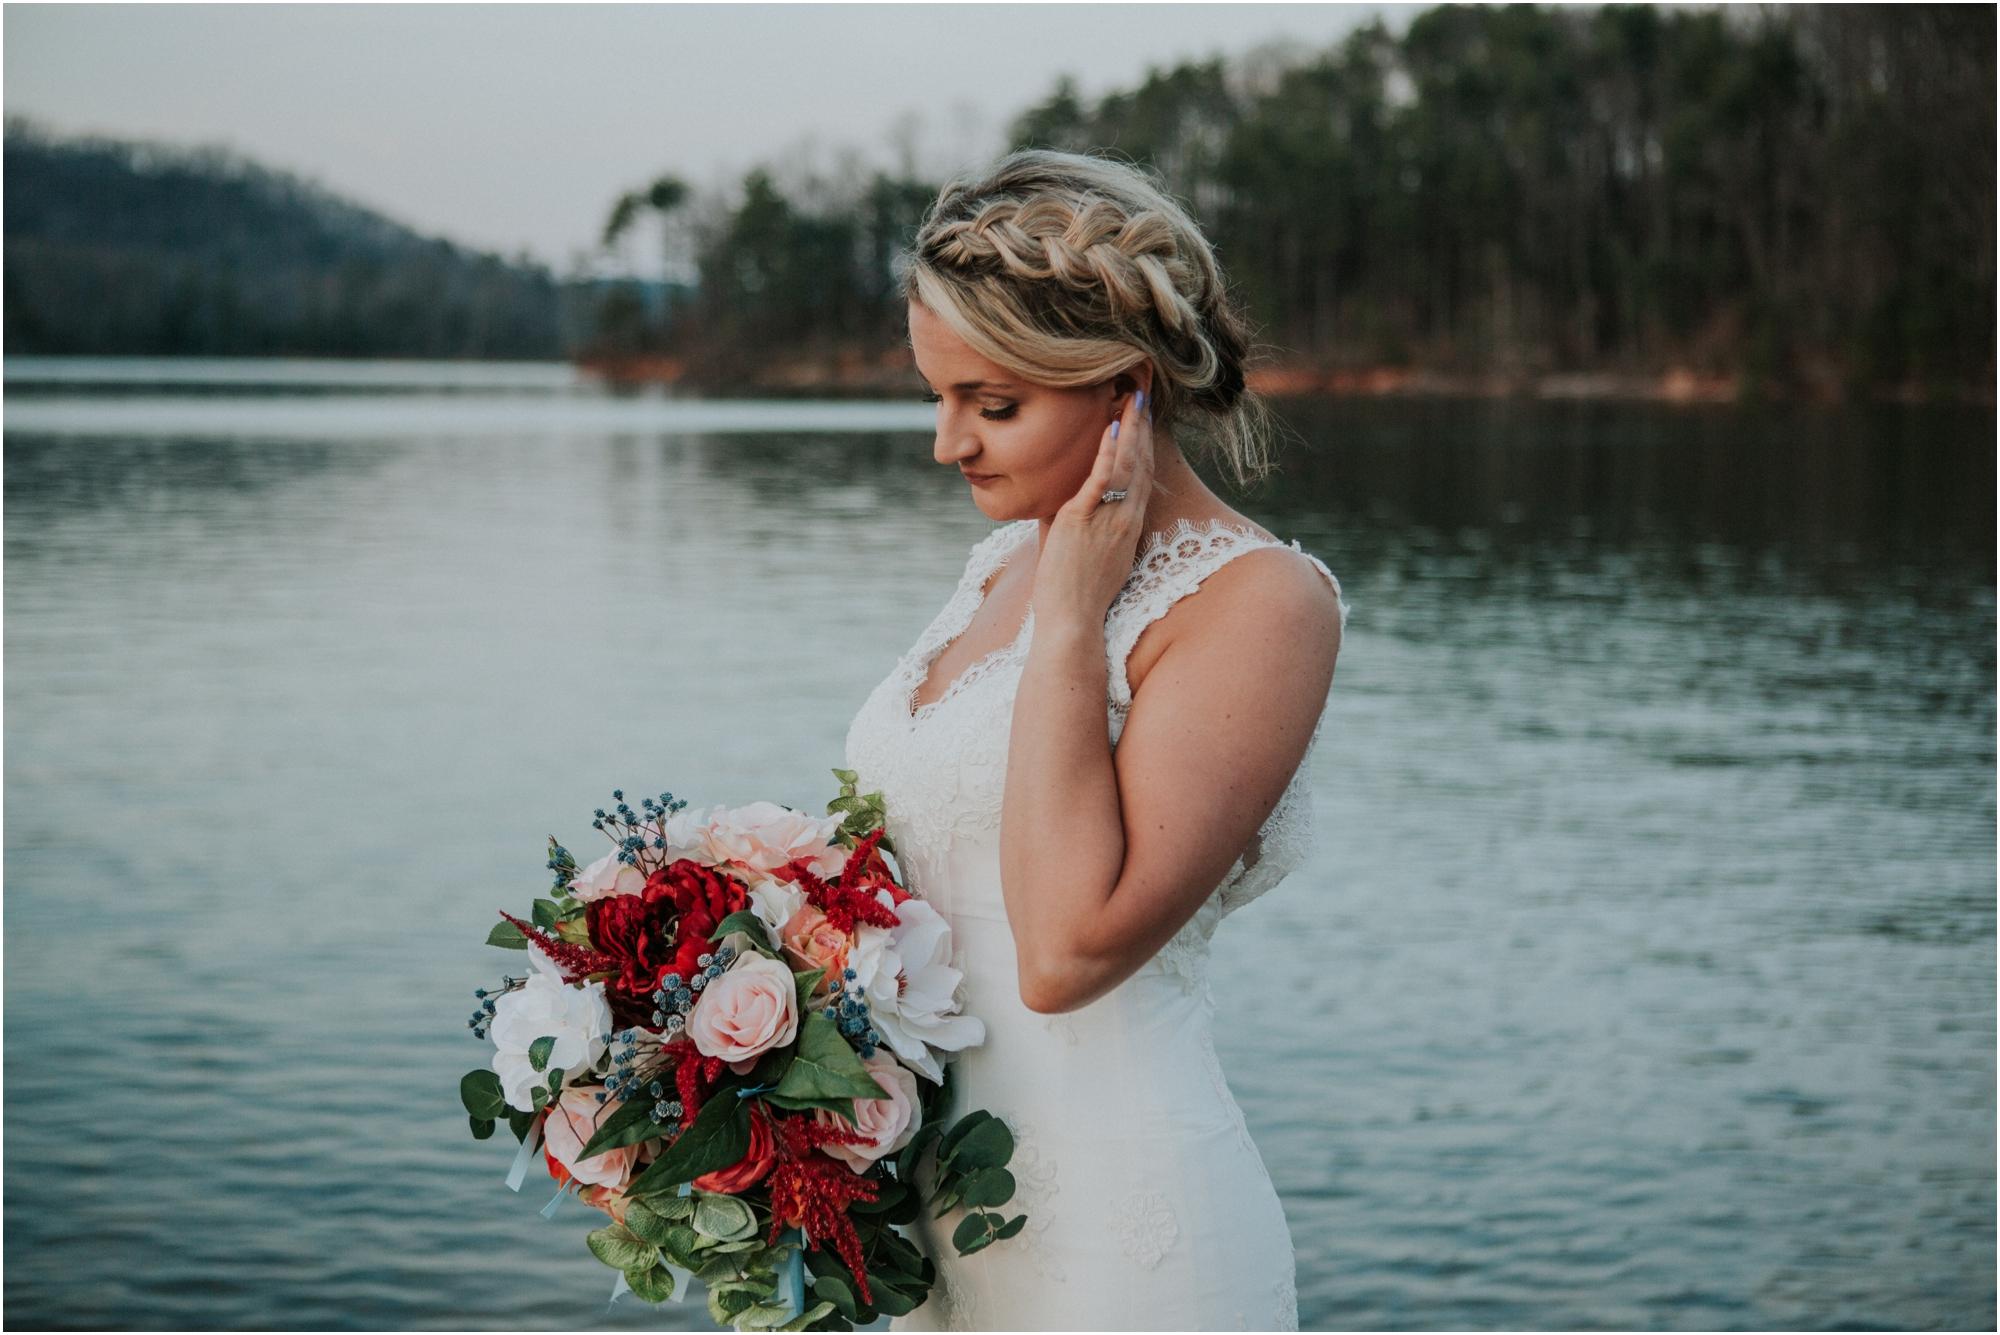 watauga-lake--bohemian-bridal-styled-session-northeast-tennessee-wedding-elopement-photography_0015.jpg